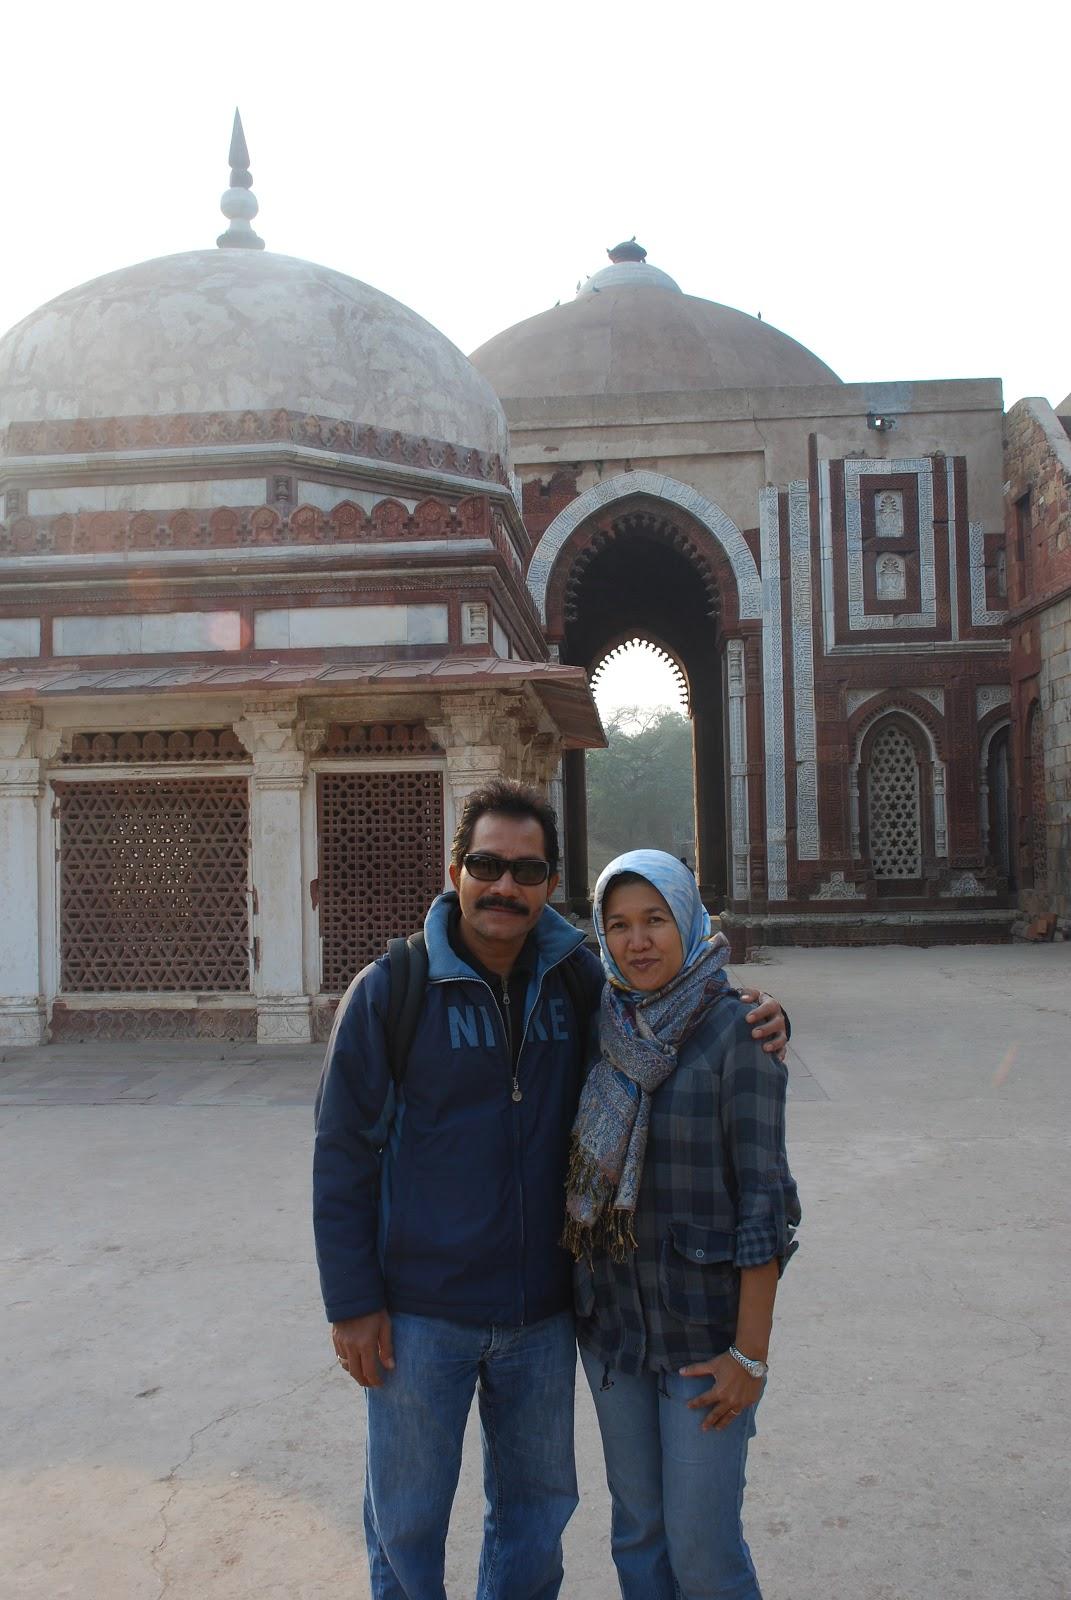 Qutubuddin Aibak Mosque